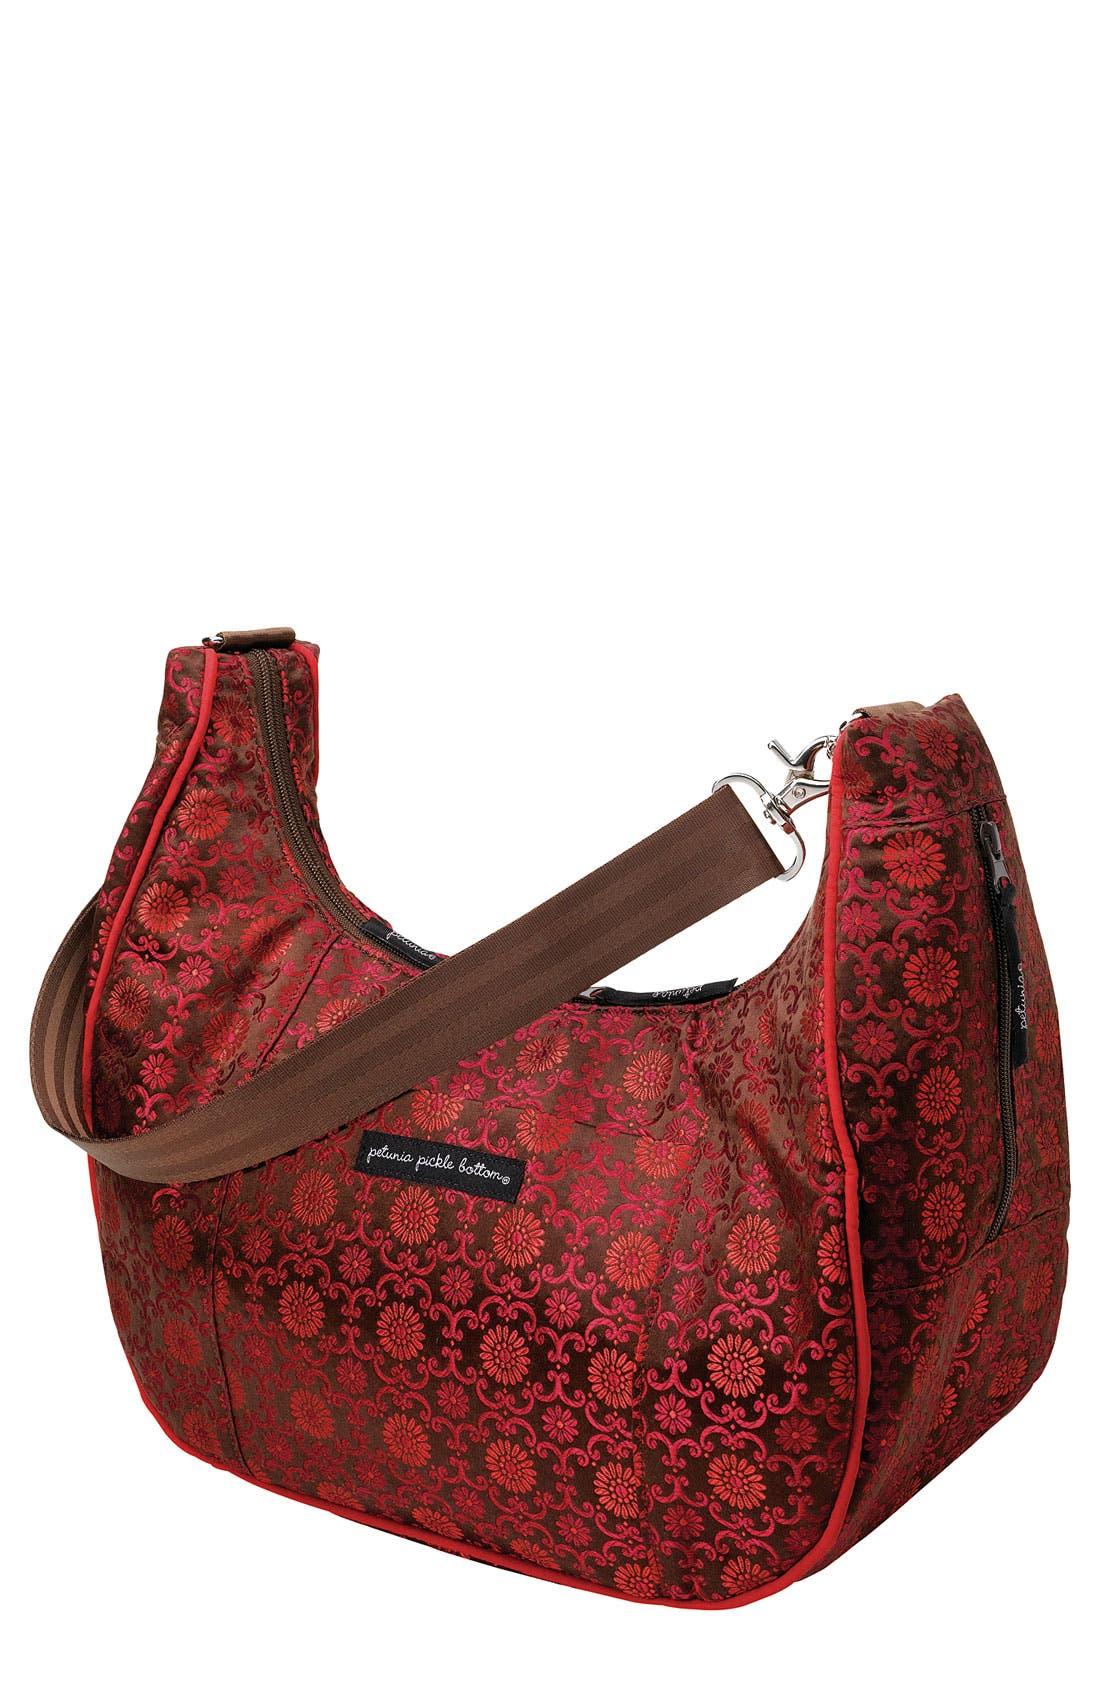 Alternate Image 1 Selected - Petunia Pickle Bottom 'Touring Tote' Glazed Diaper Bag